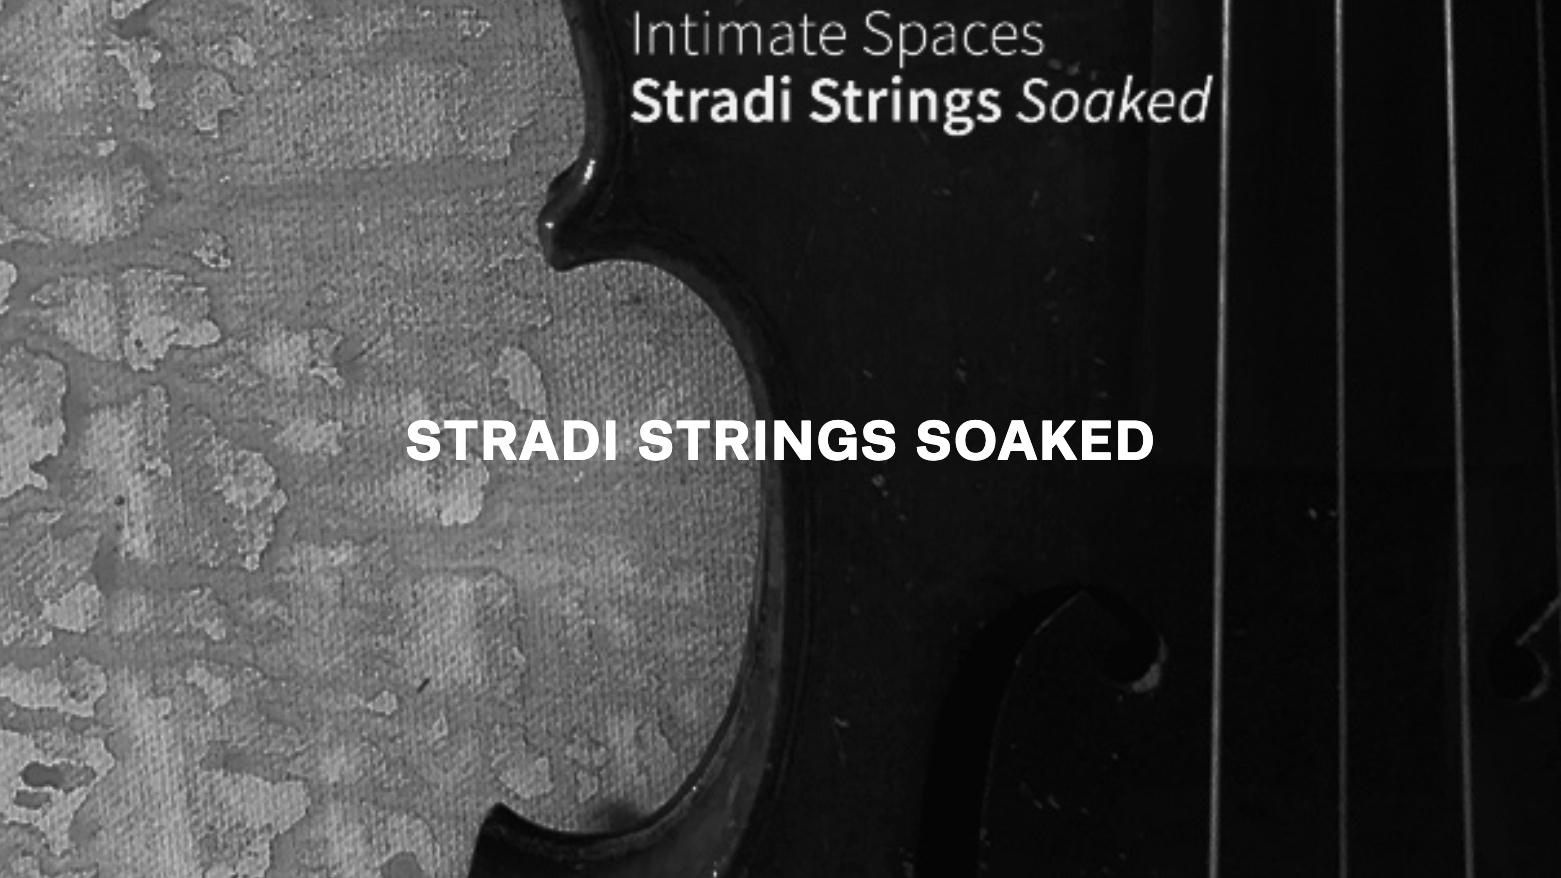 stradi strings text.jpg